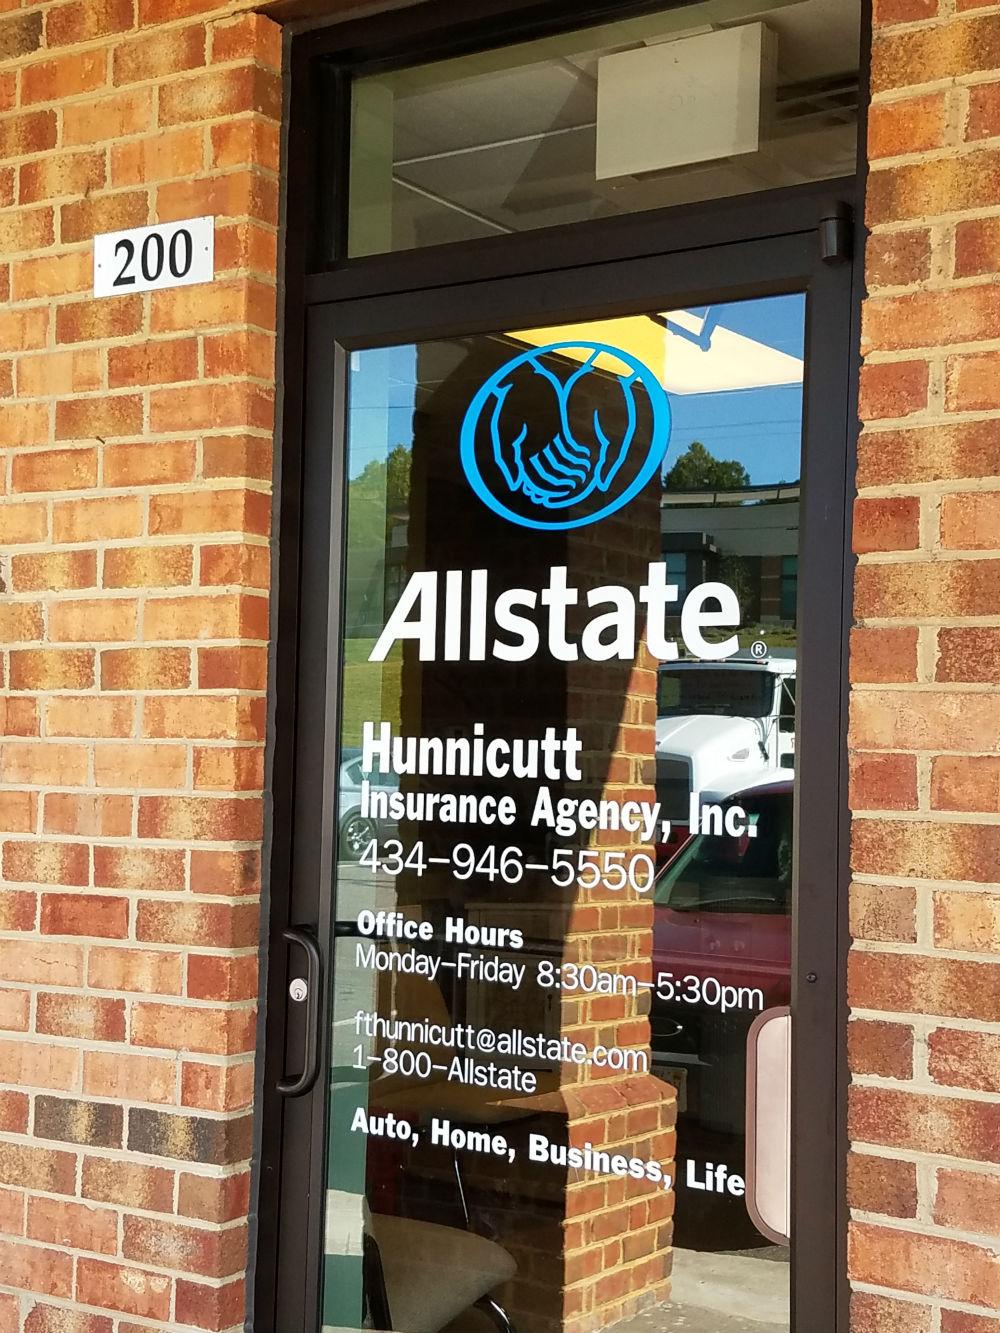 Fred Hunnicutt: Allstate Insurance image 2